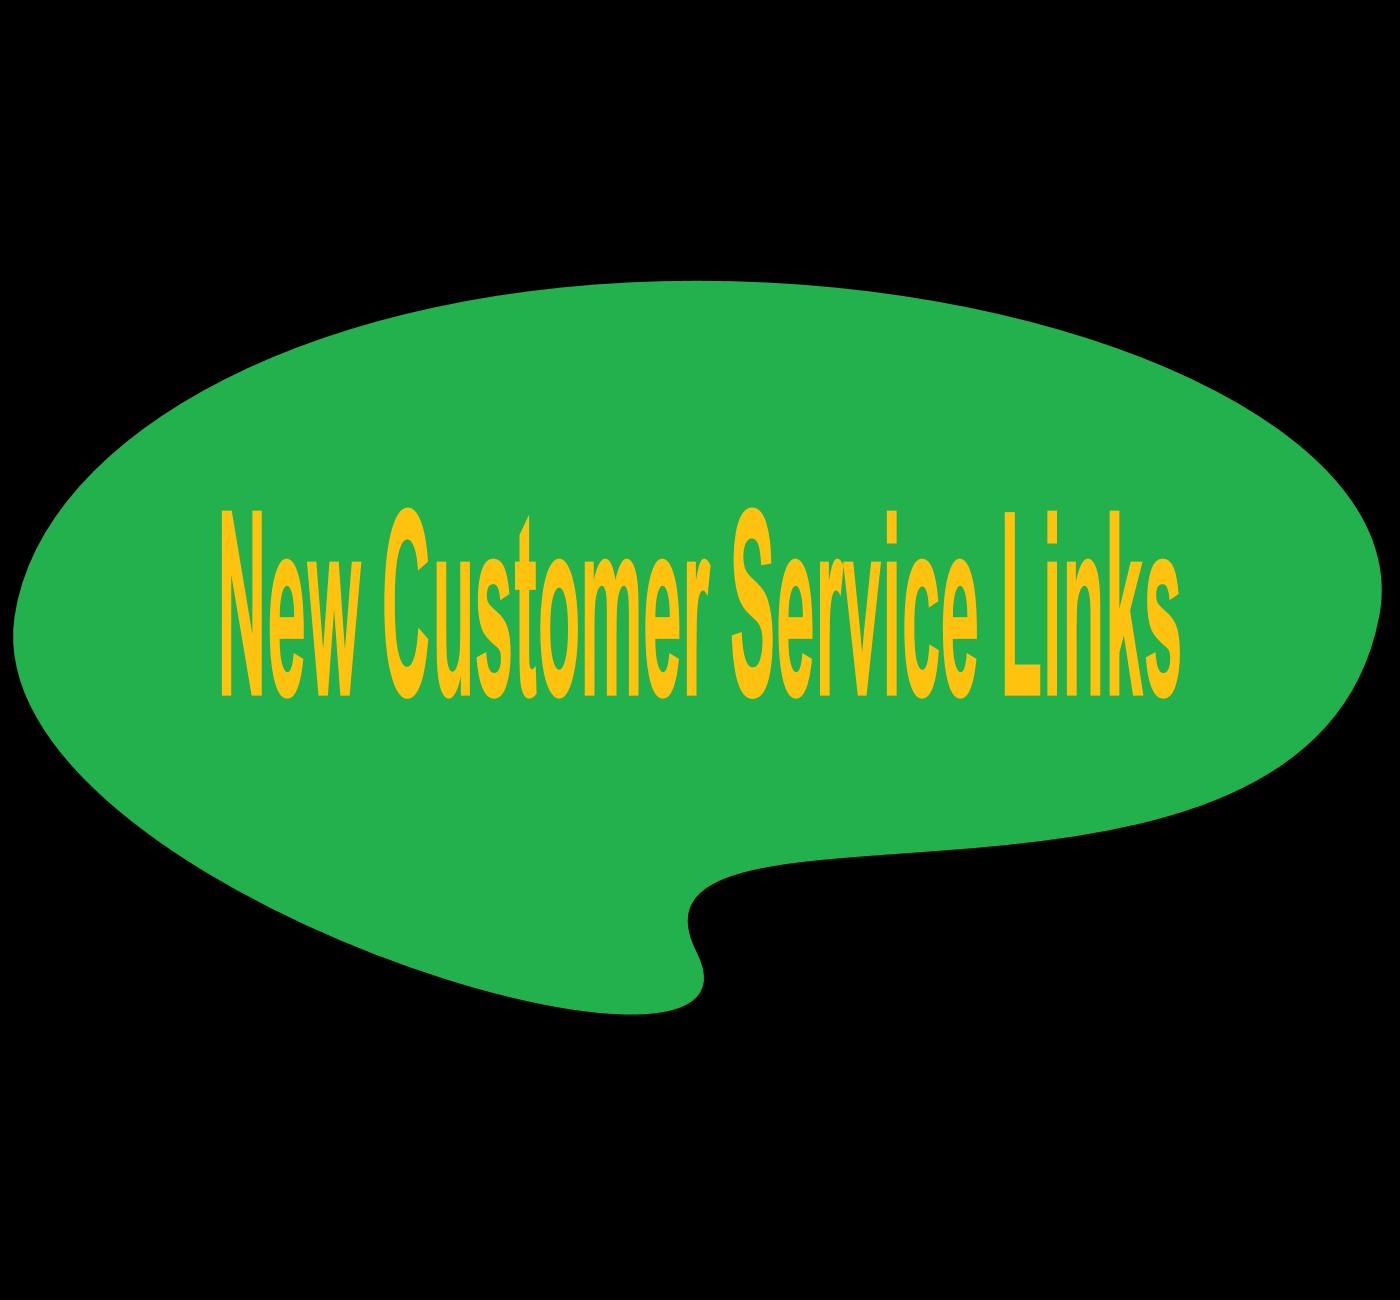 New Customer Service Links